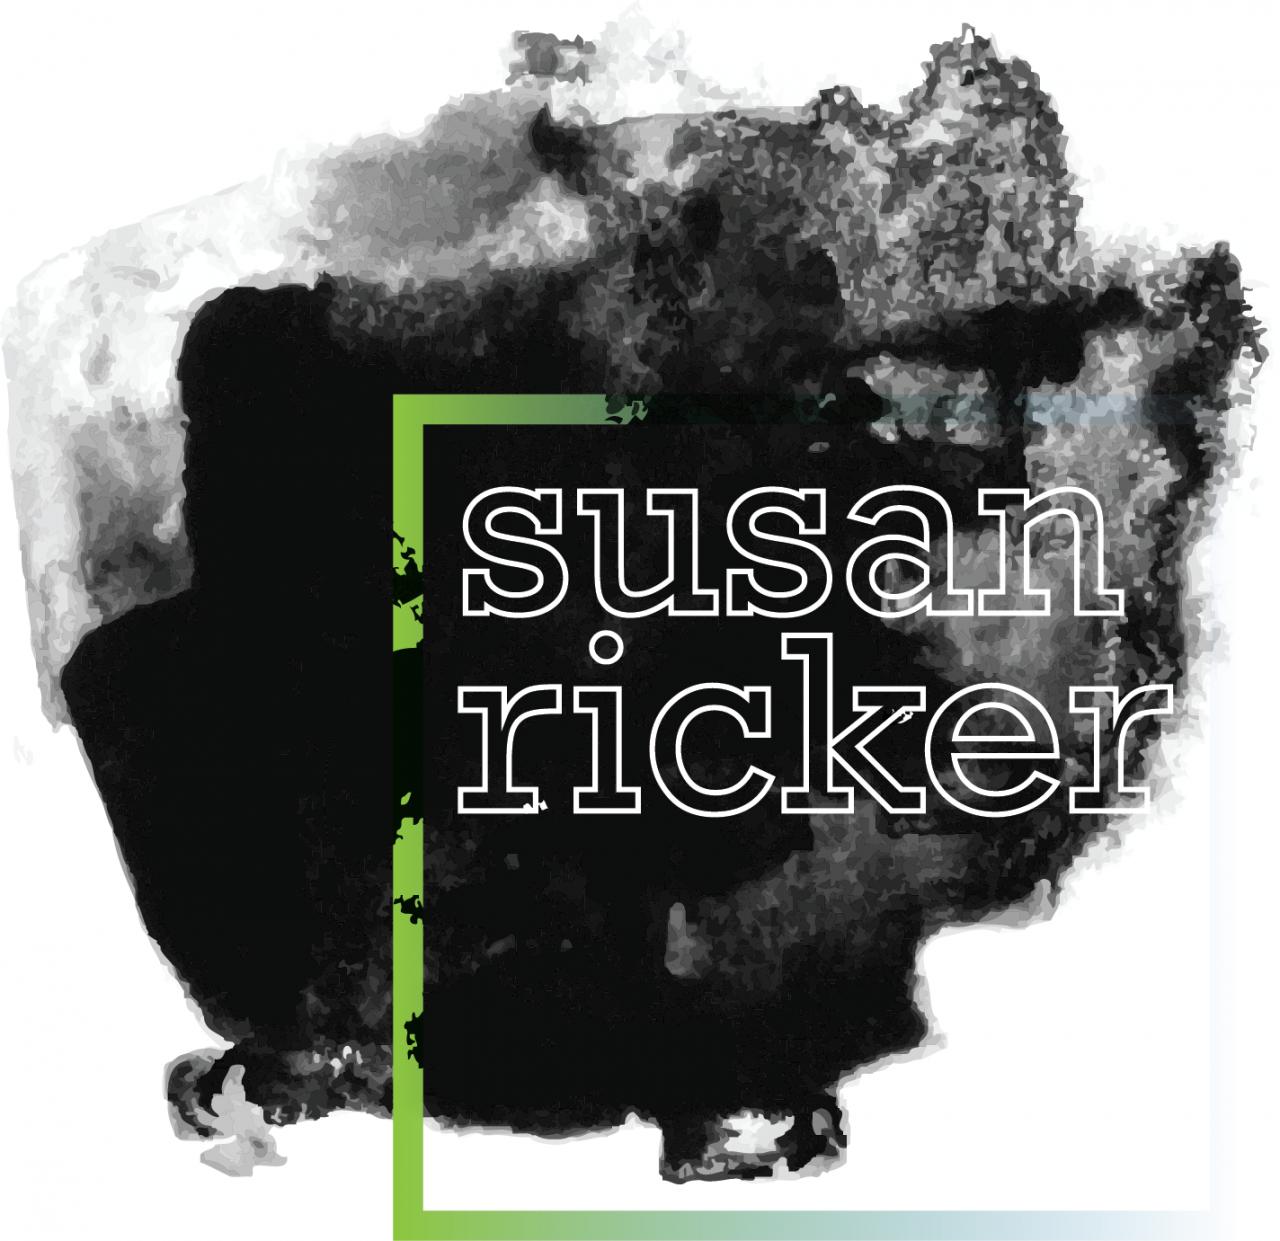 Susan Ricker